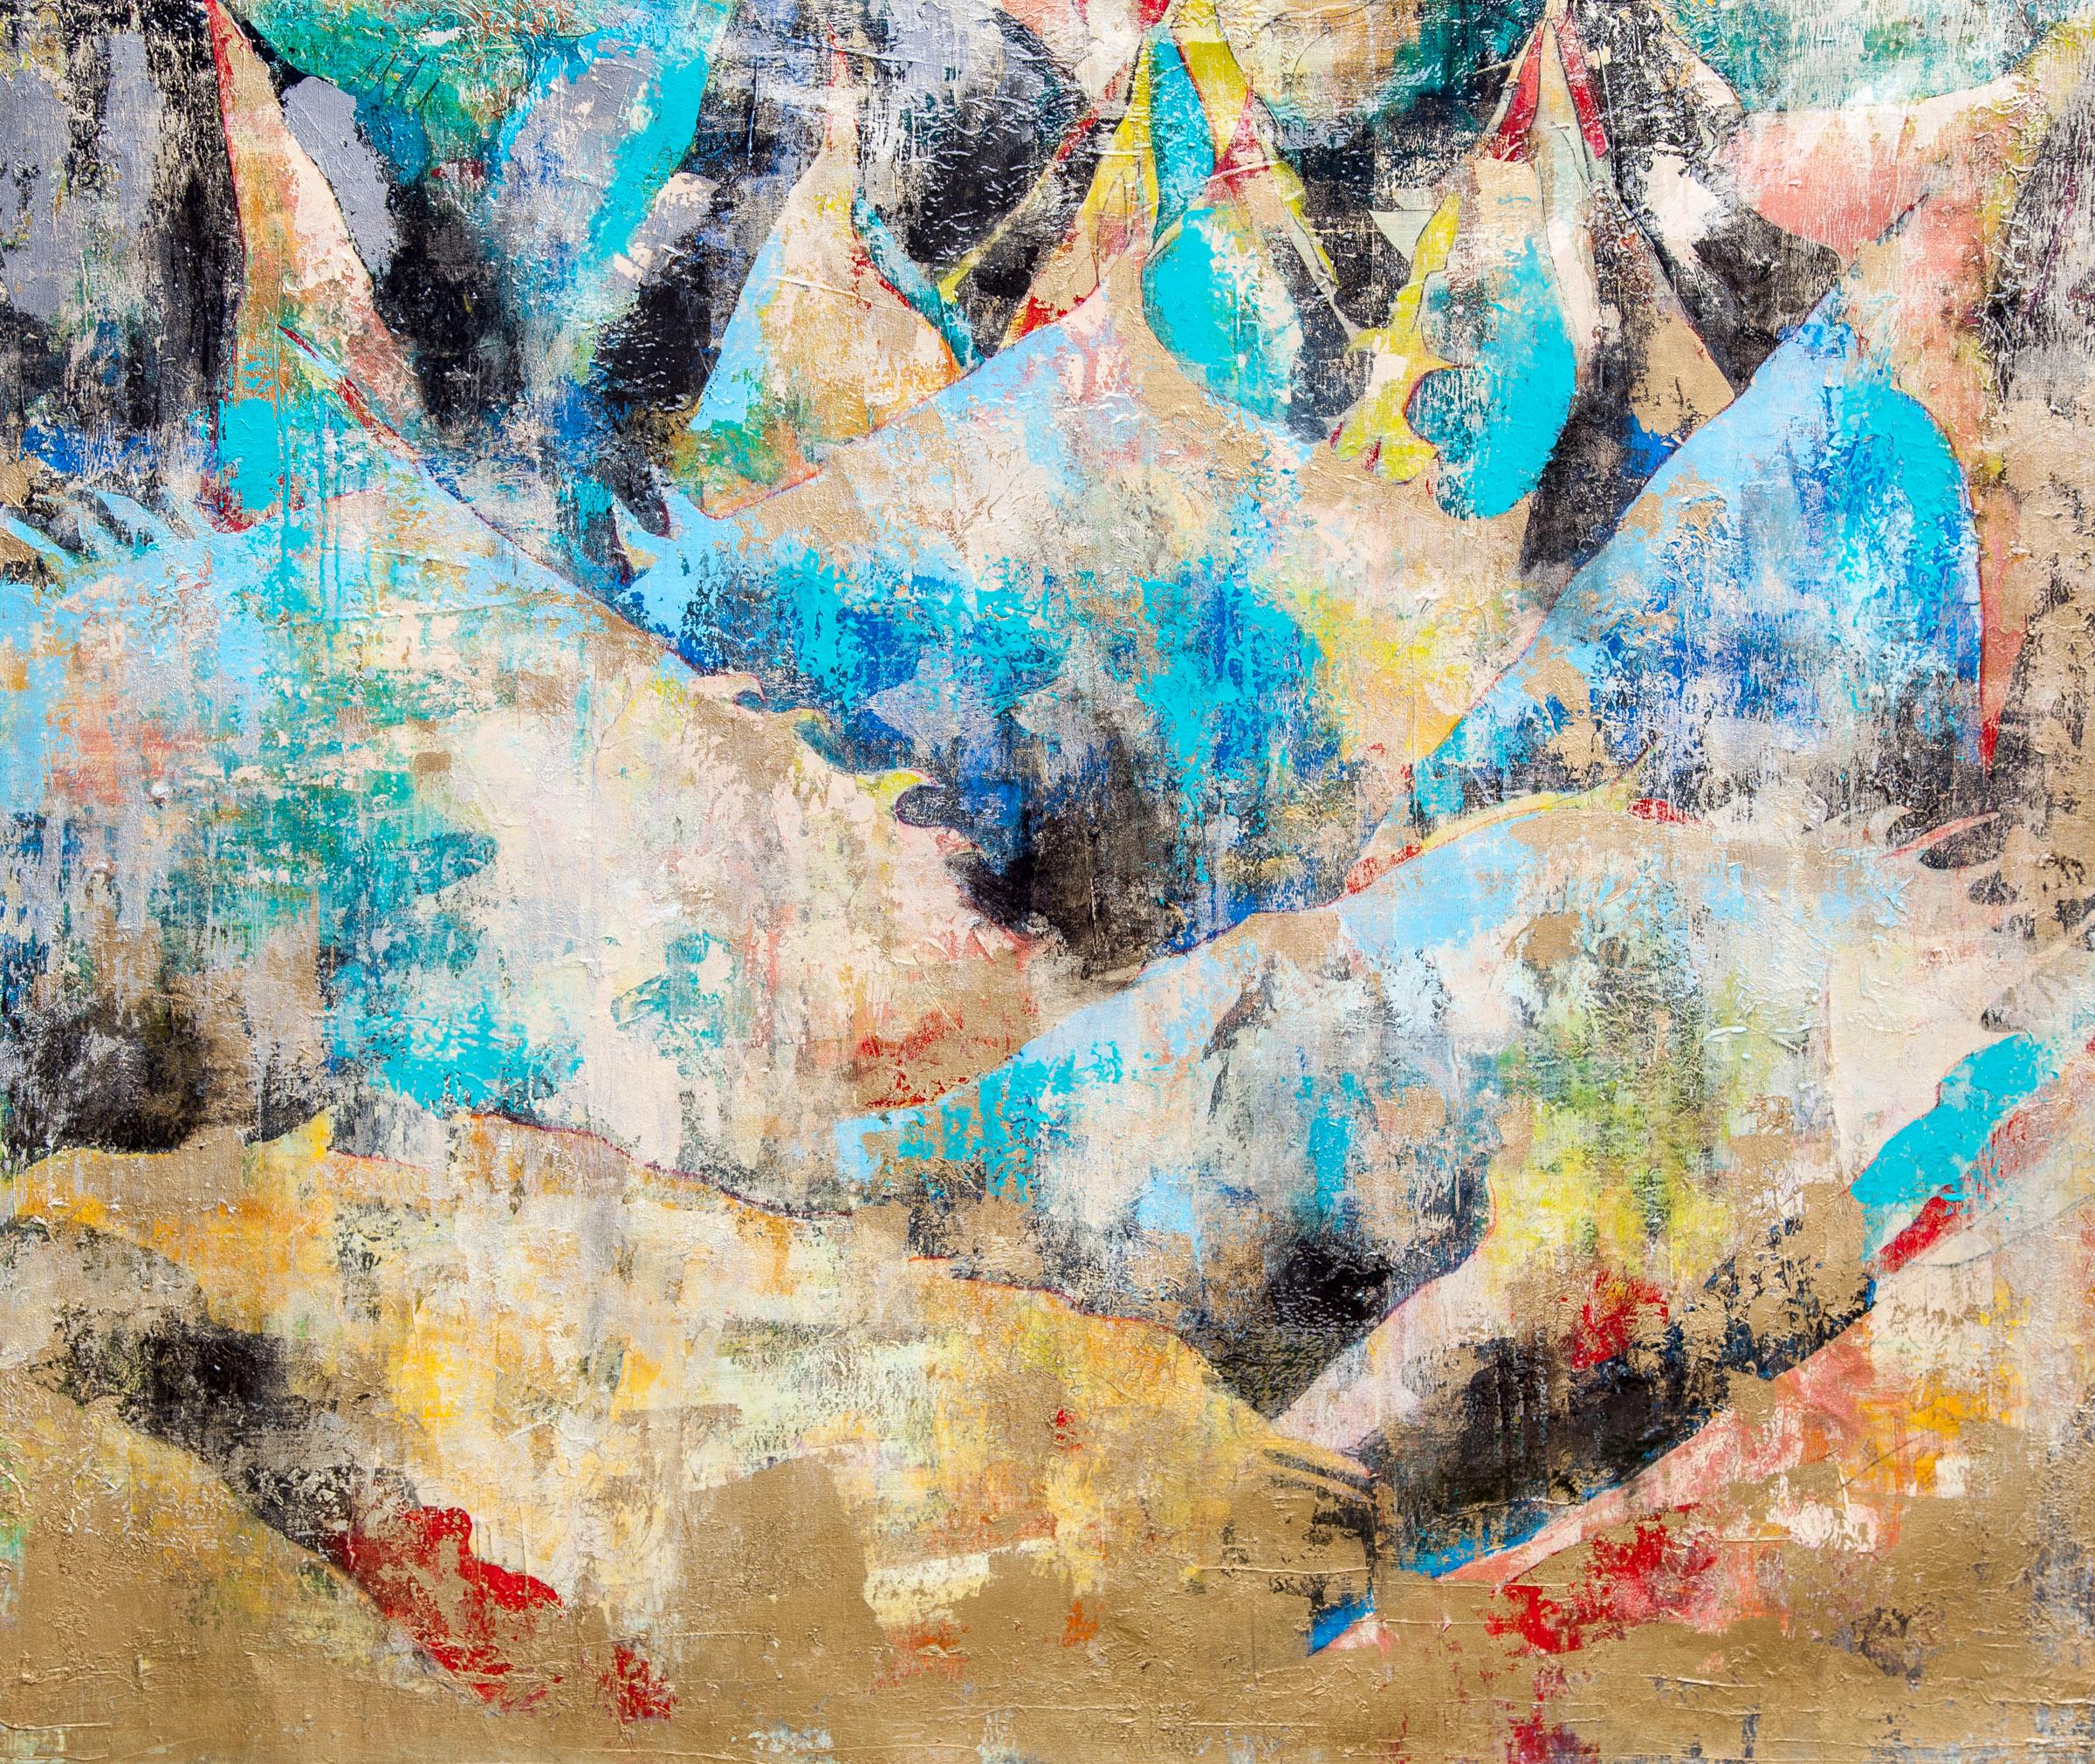 Lisa Macchiaroli - Midnight Agave 50x60